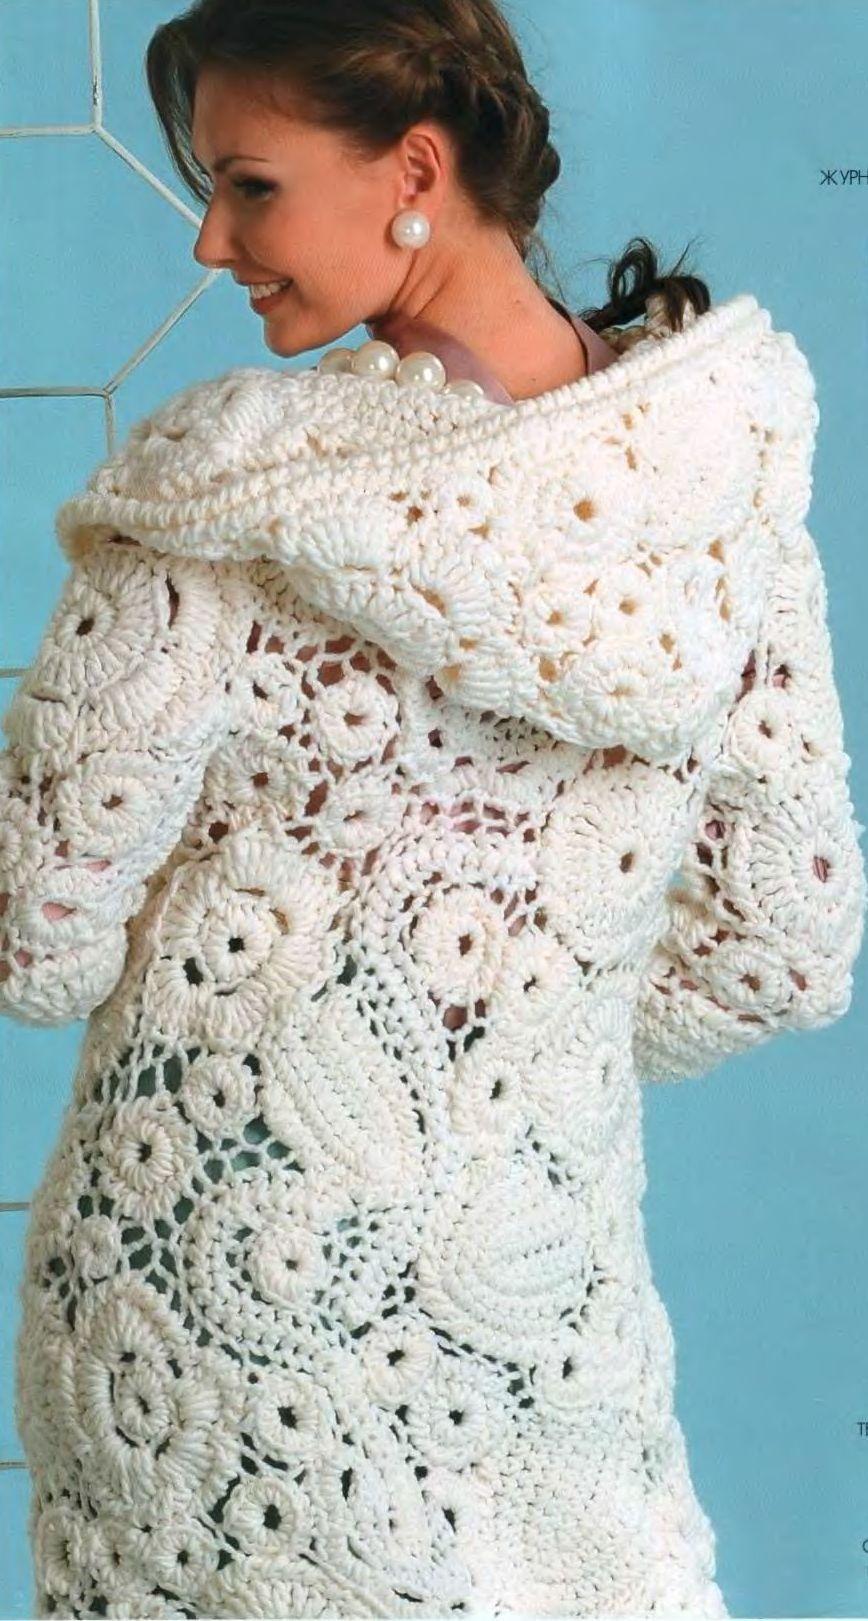 Pin by Carla Laney on Crochet favorites | Pinterest | Croché ...